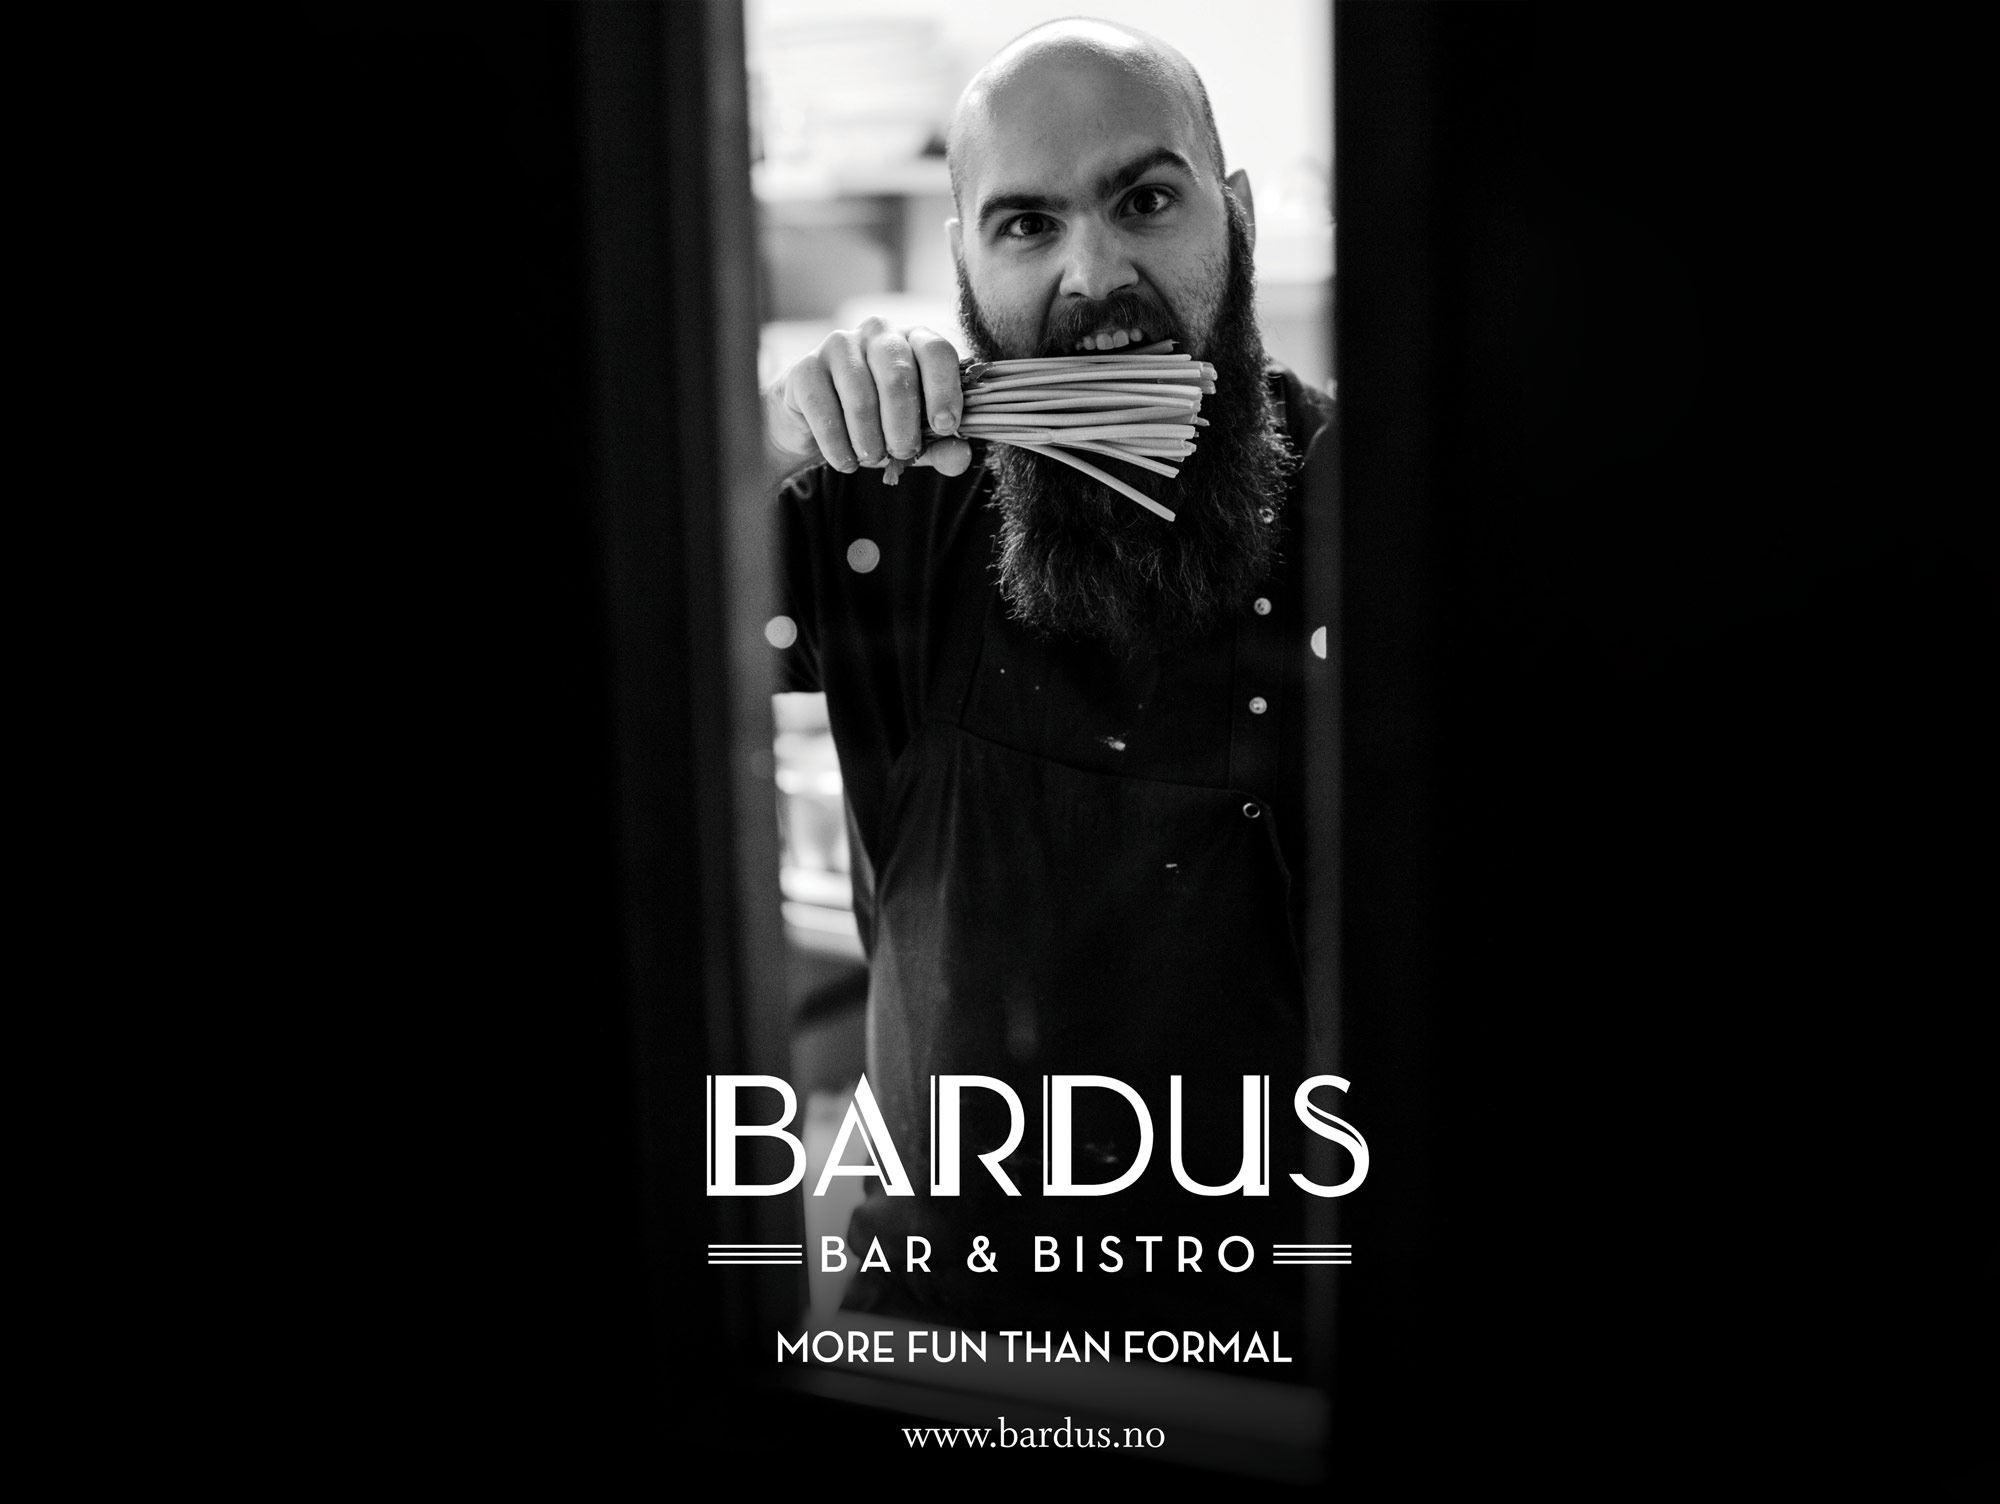 Bardus Bar